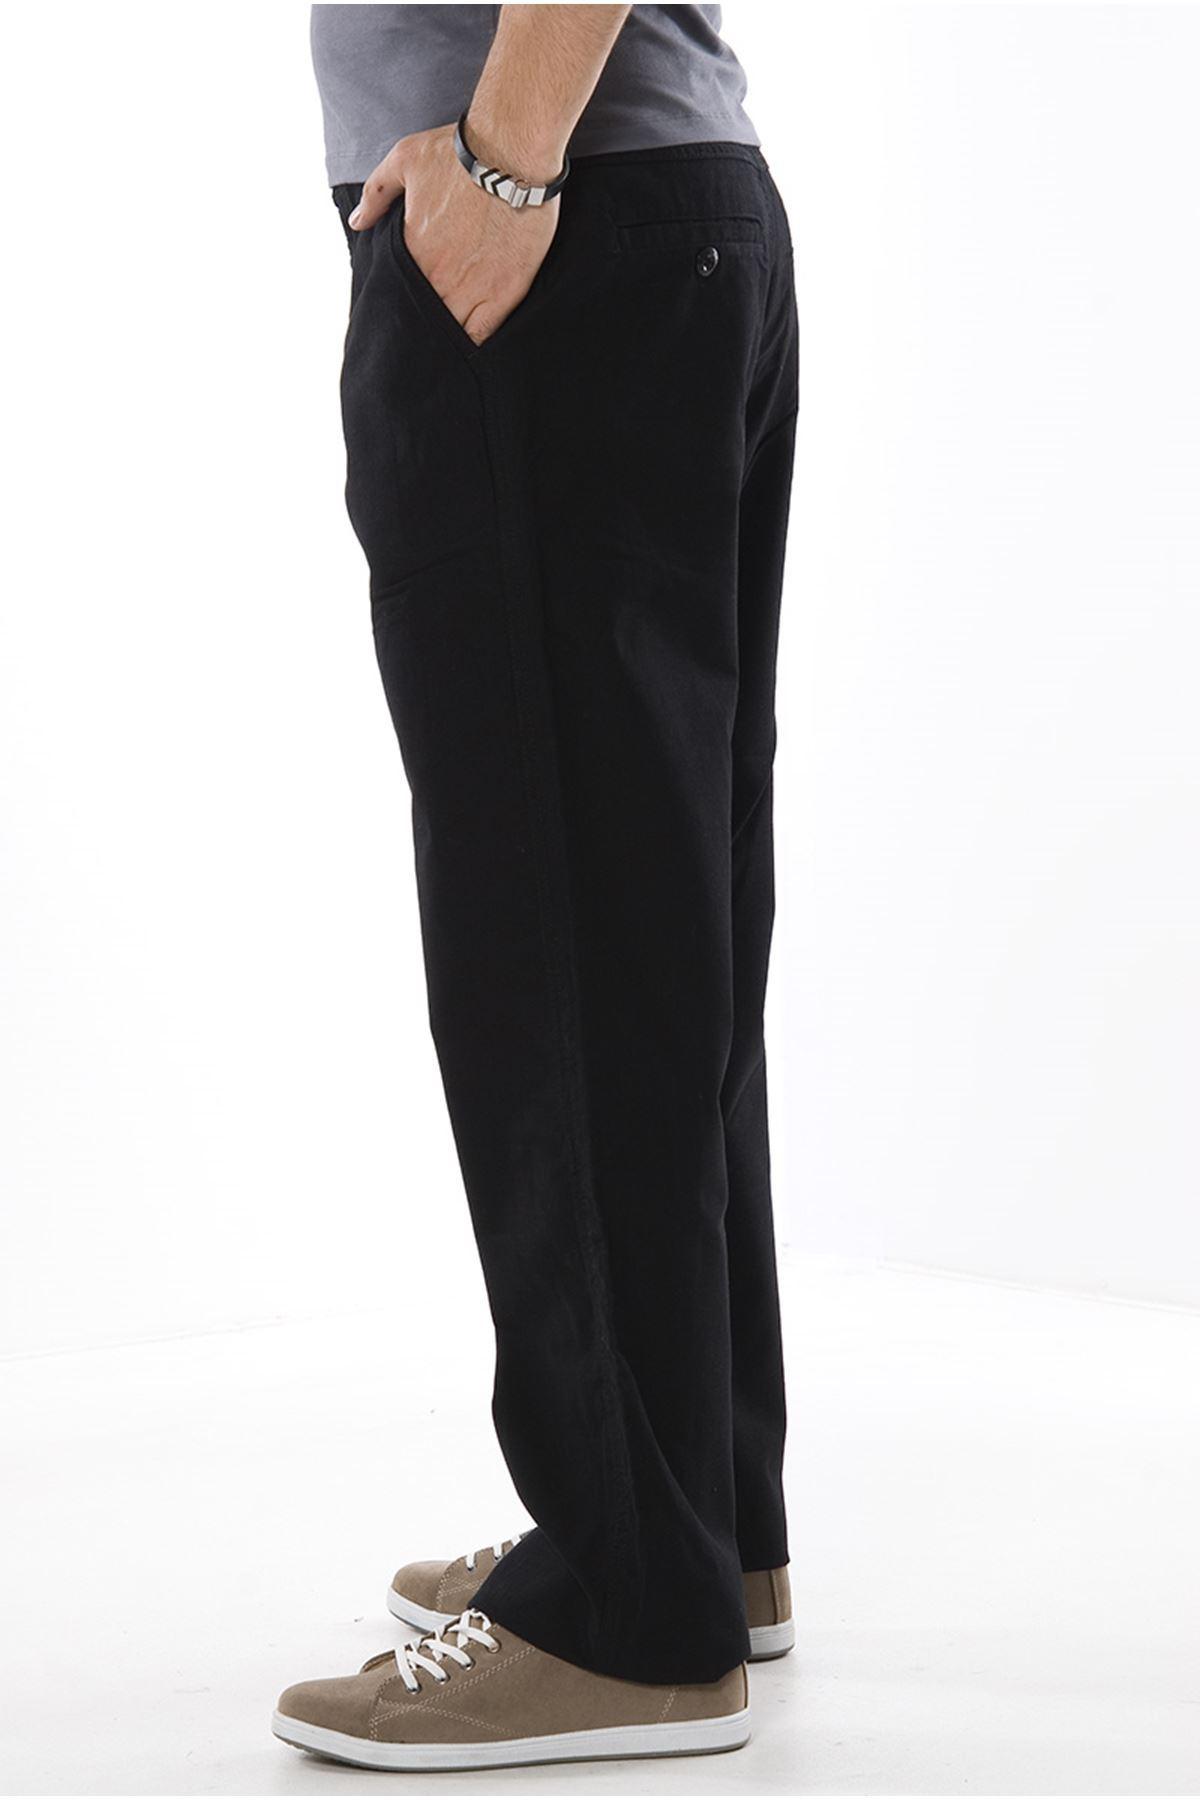 Siyah Pantolon 18B-9187